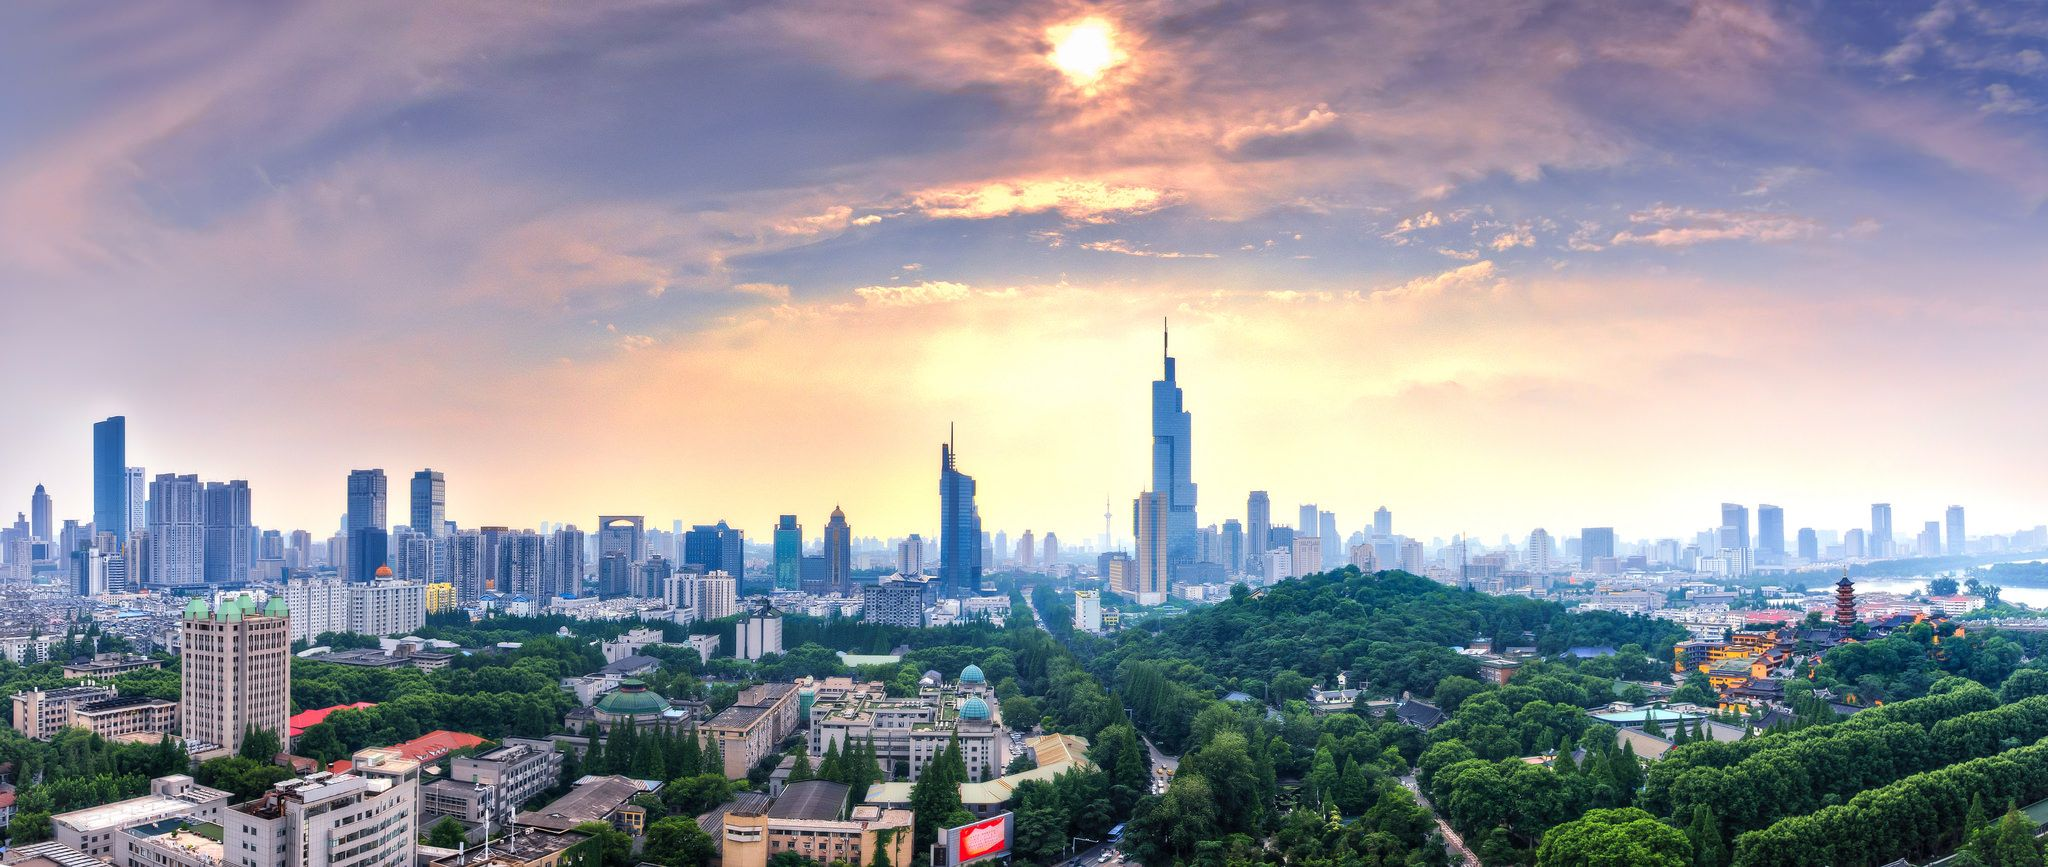 Panorama Of West Nanjing City Skyline Panorama Photography City Skyline Skyline